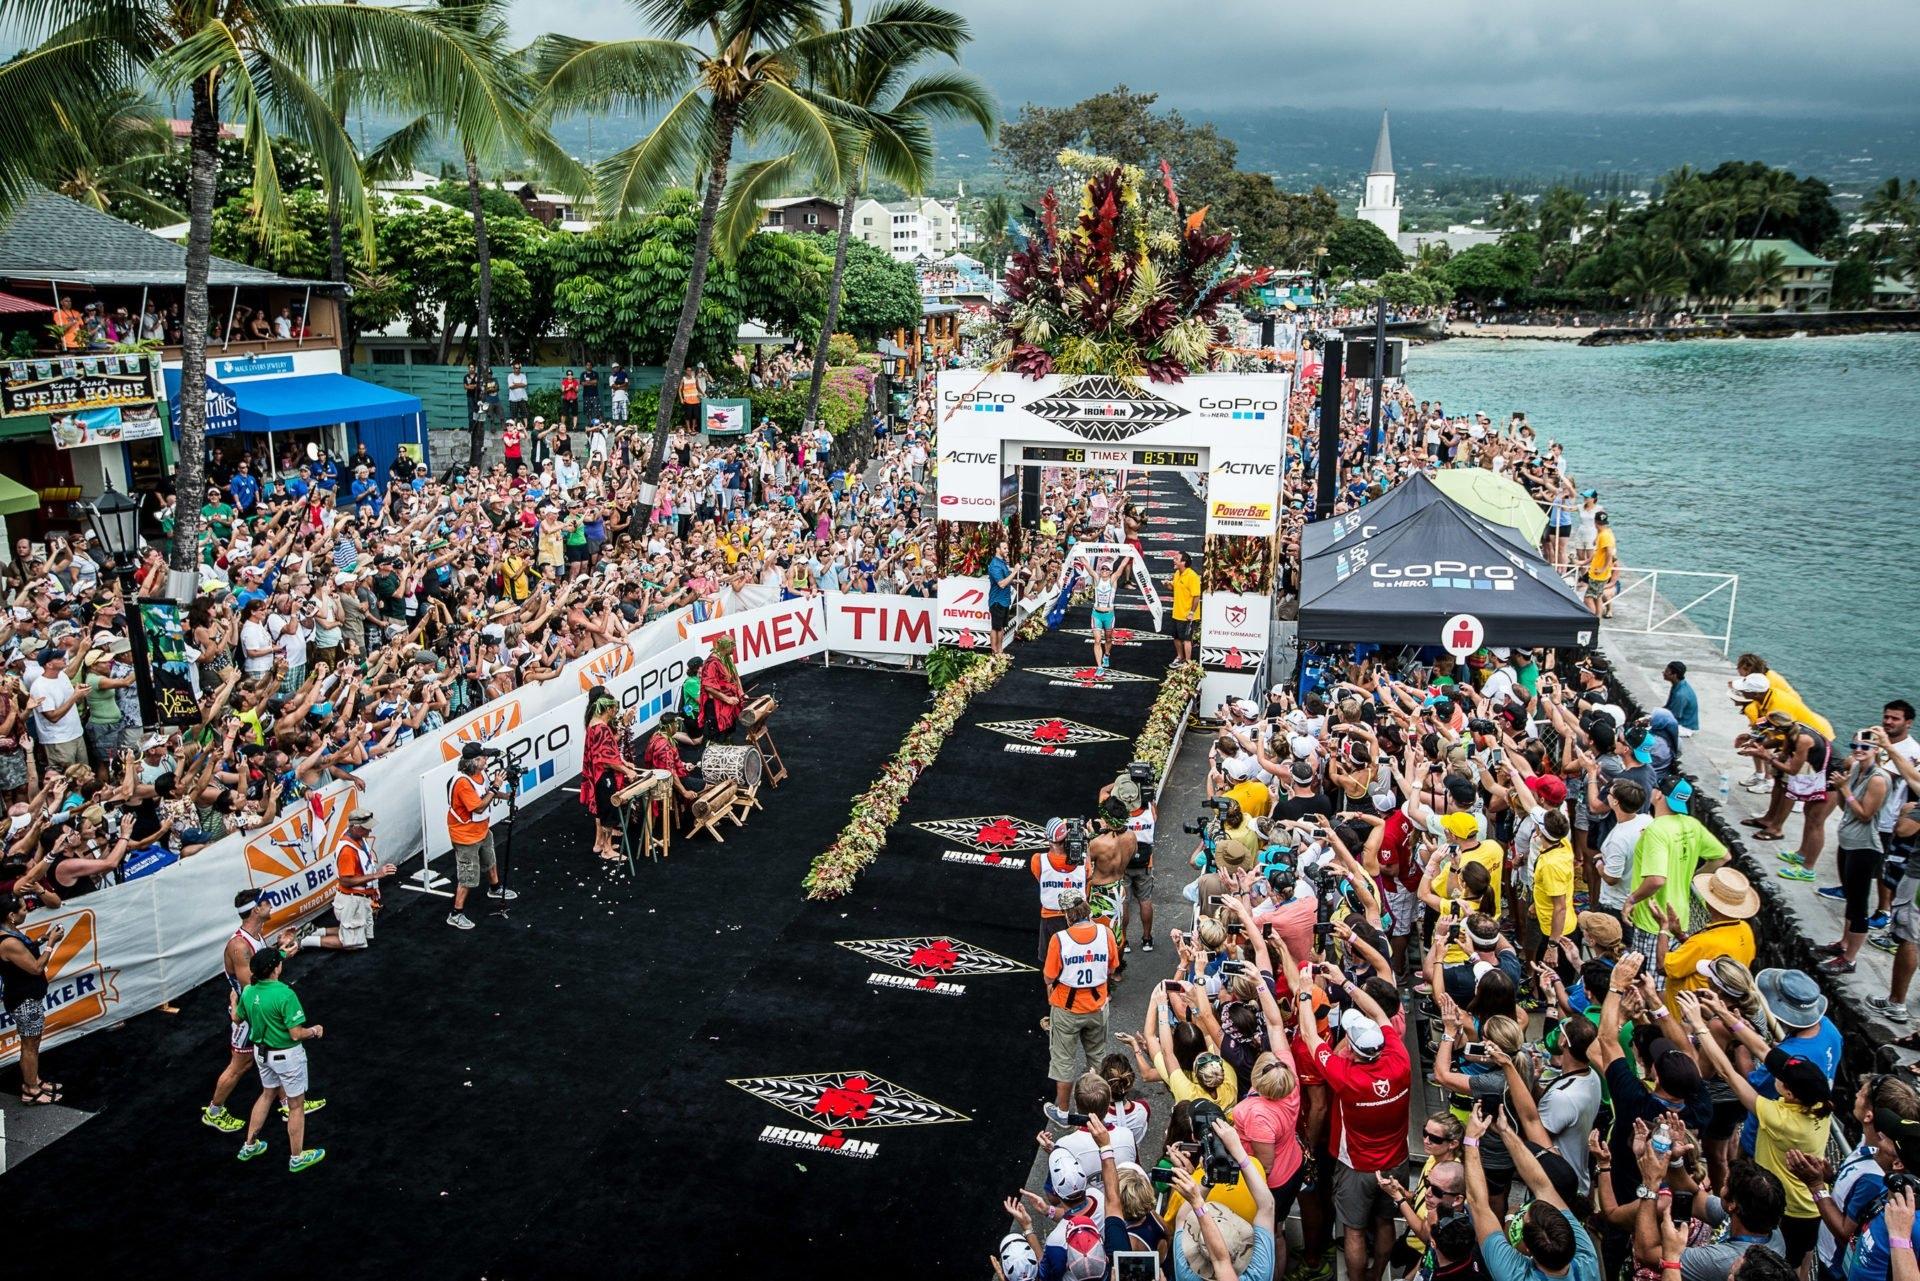 Ironman: Pro Qualifying For Ironman And 70.3 World Championship 70.3 Calendar 2019